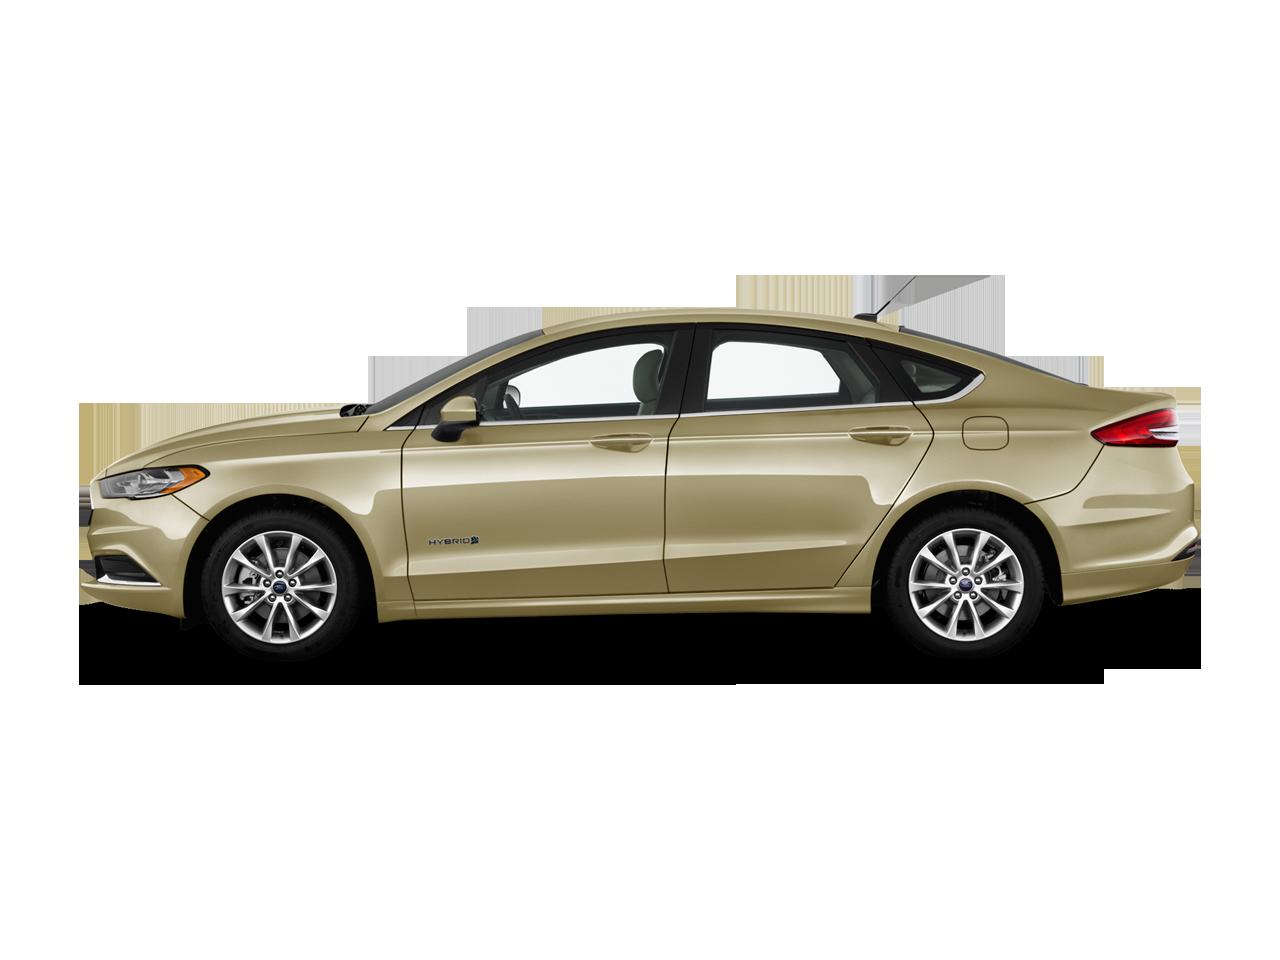 Used 2017 Ford Fusion Hybrid Titanium Fwd Industrial Loop 2005 Kia Optima Wiring Shreveport La Near Texarkana Tx Orr Auto